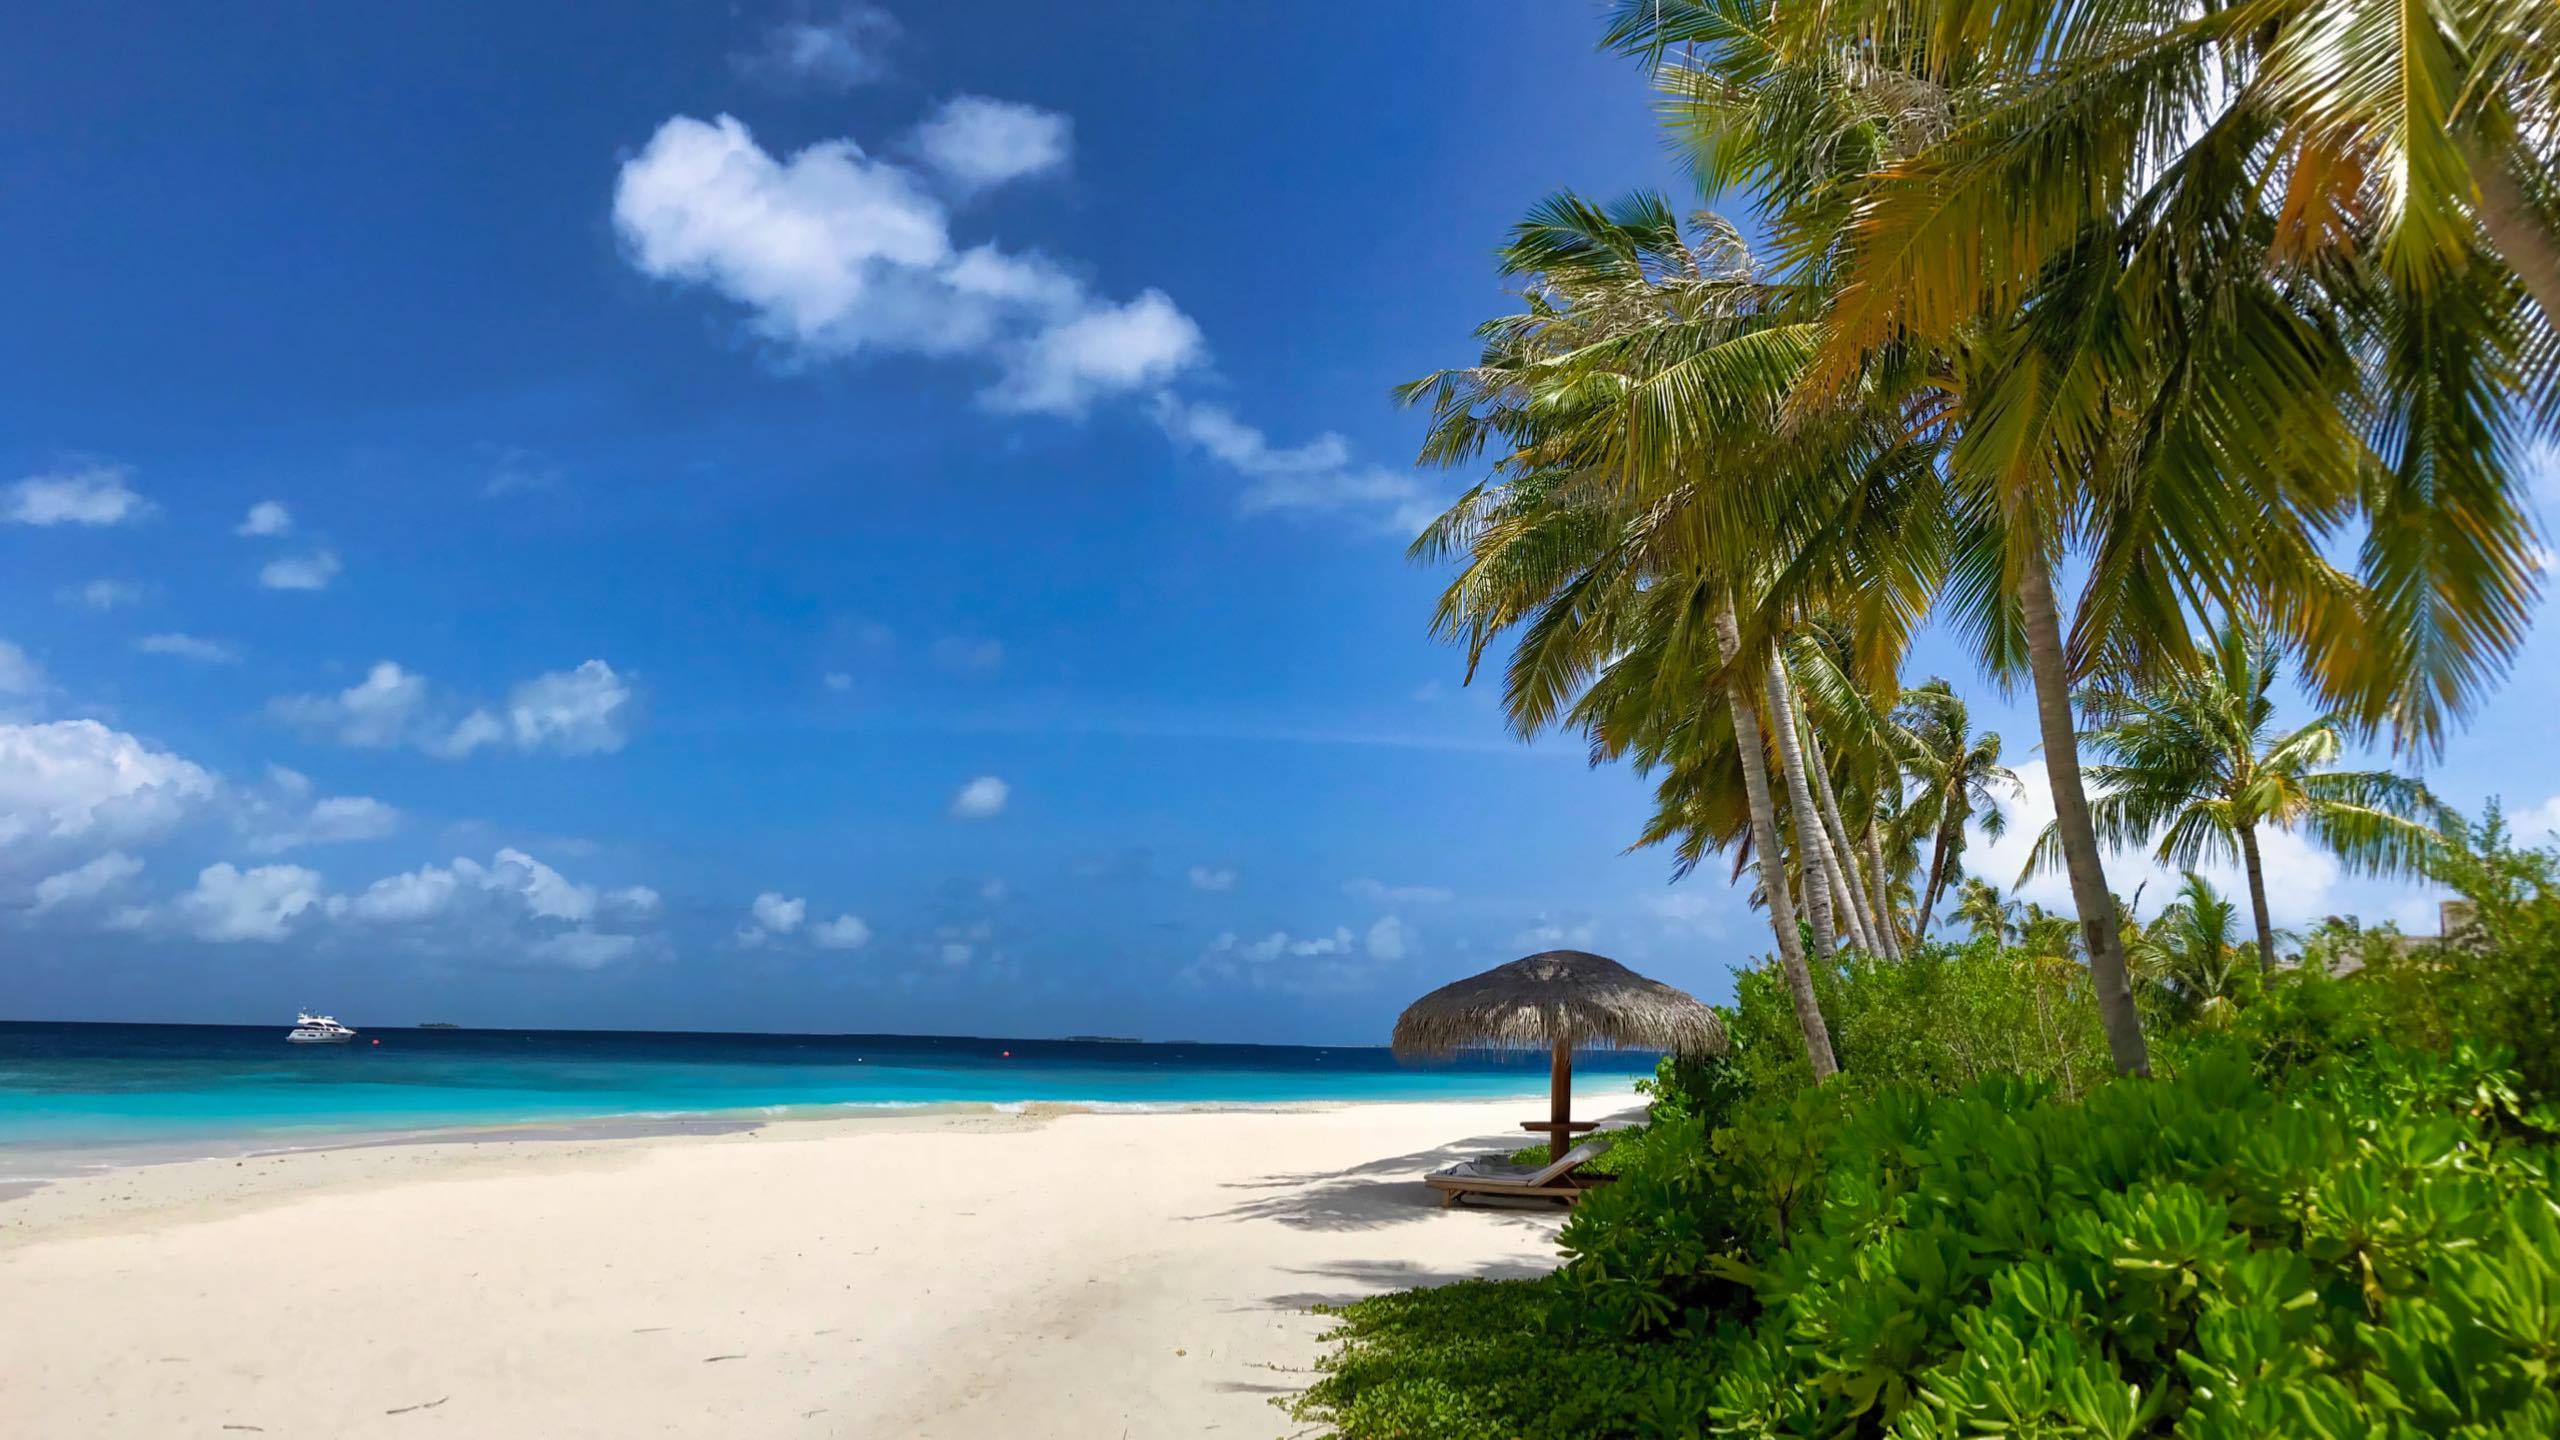 Milaidhoo Island Malediven Sandstrand Meer Palmen